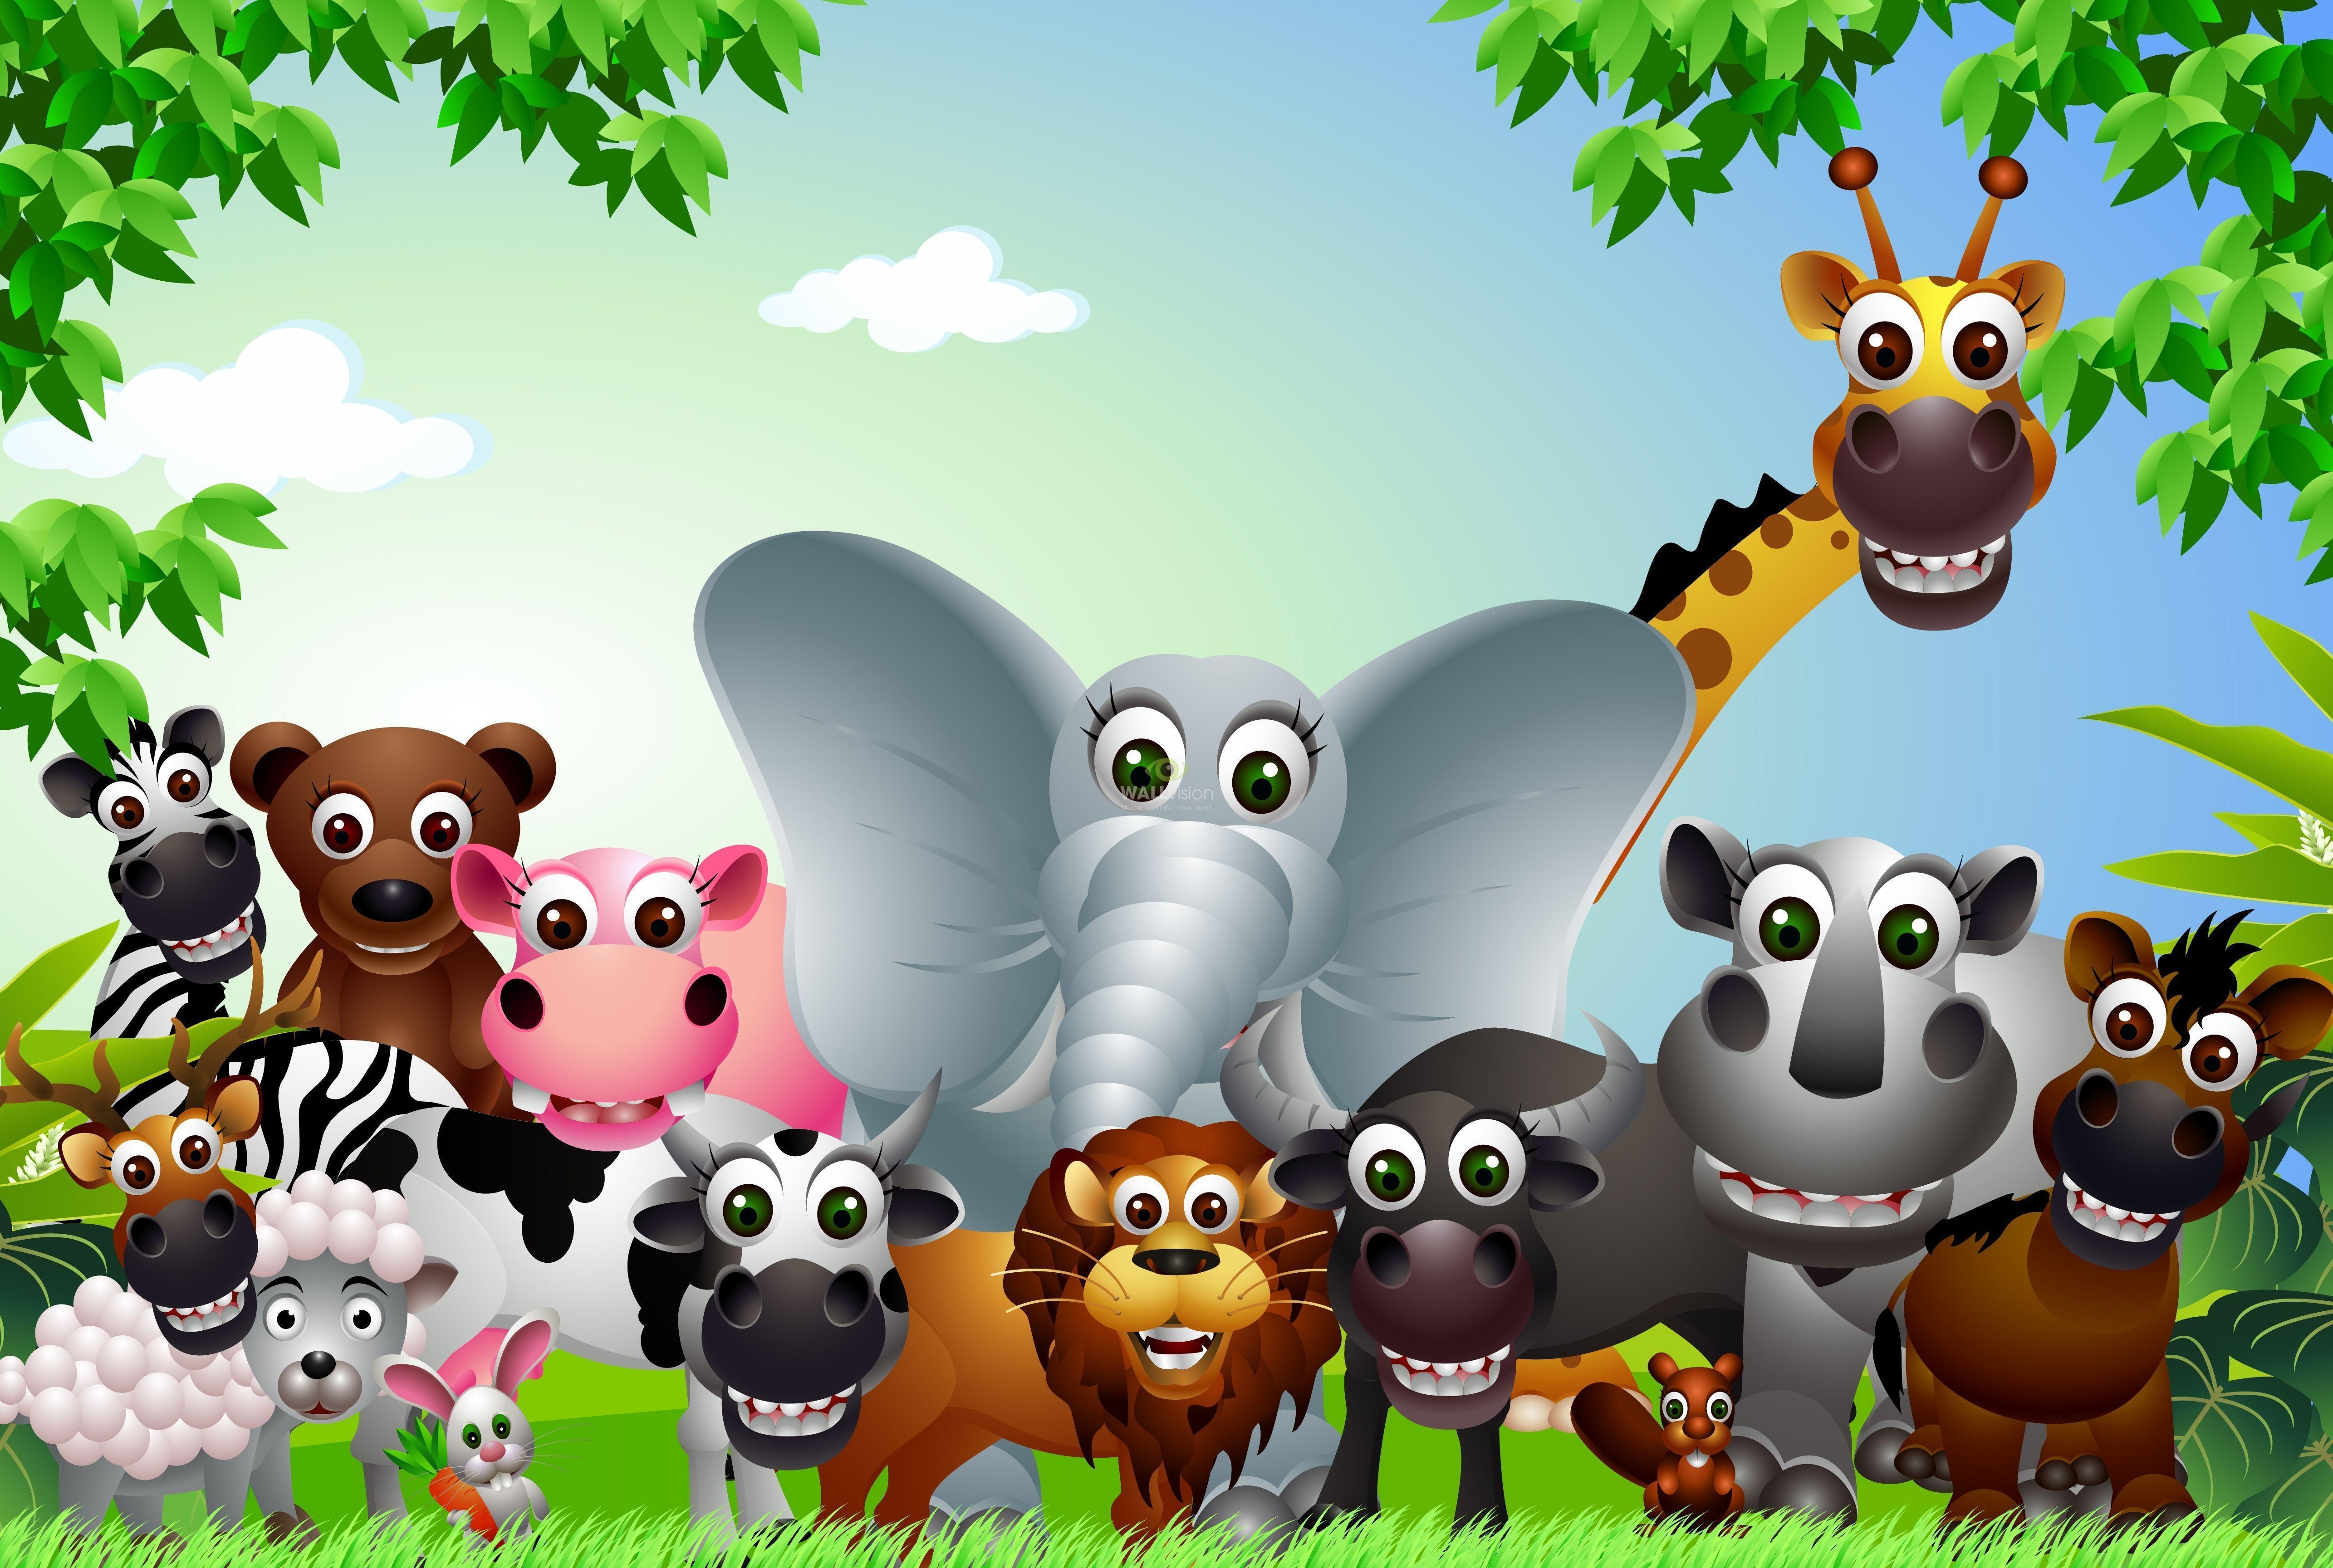 Cartoon Animals Wallpapers Top Free Cartoon Animals Backgrounds Wallpaperaccess